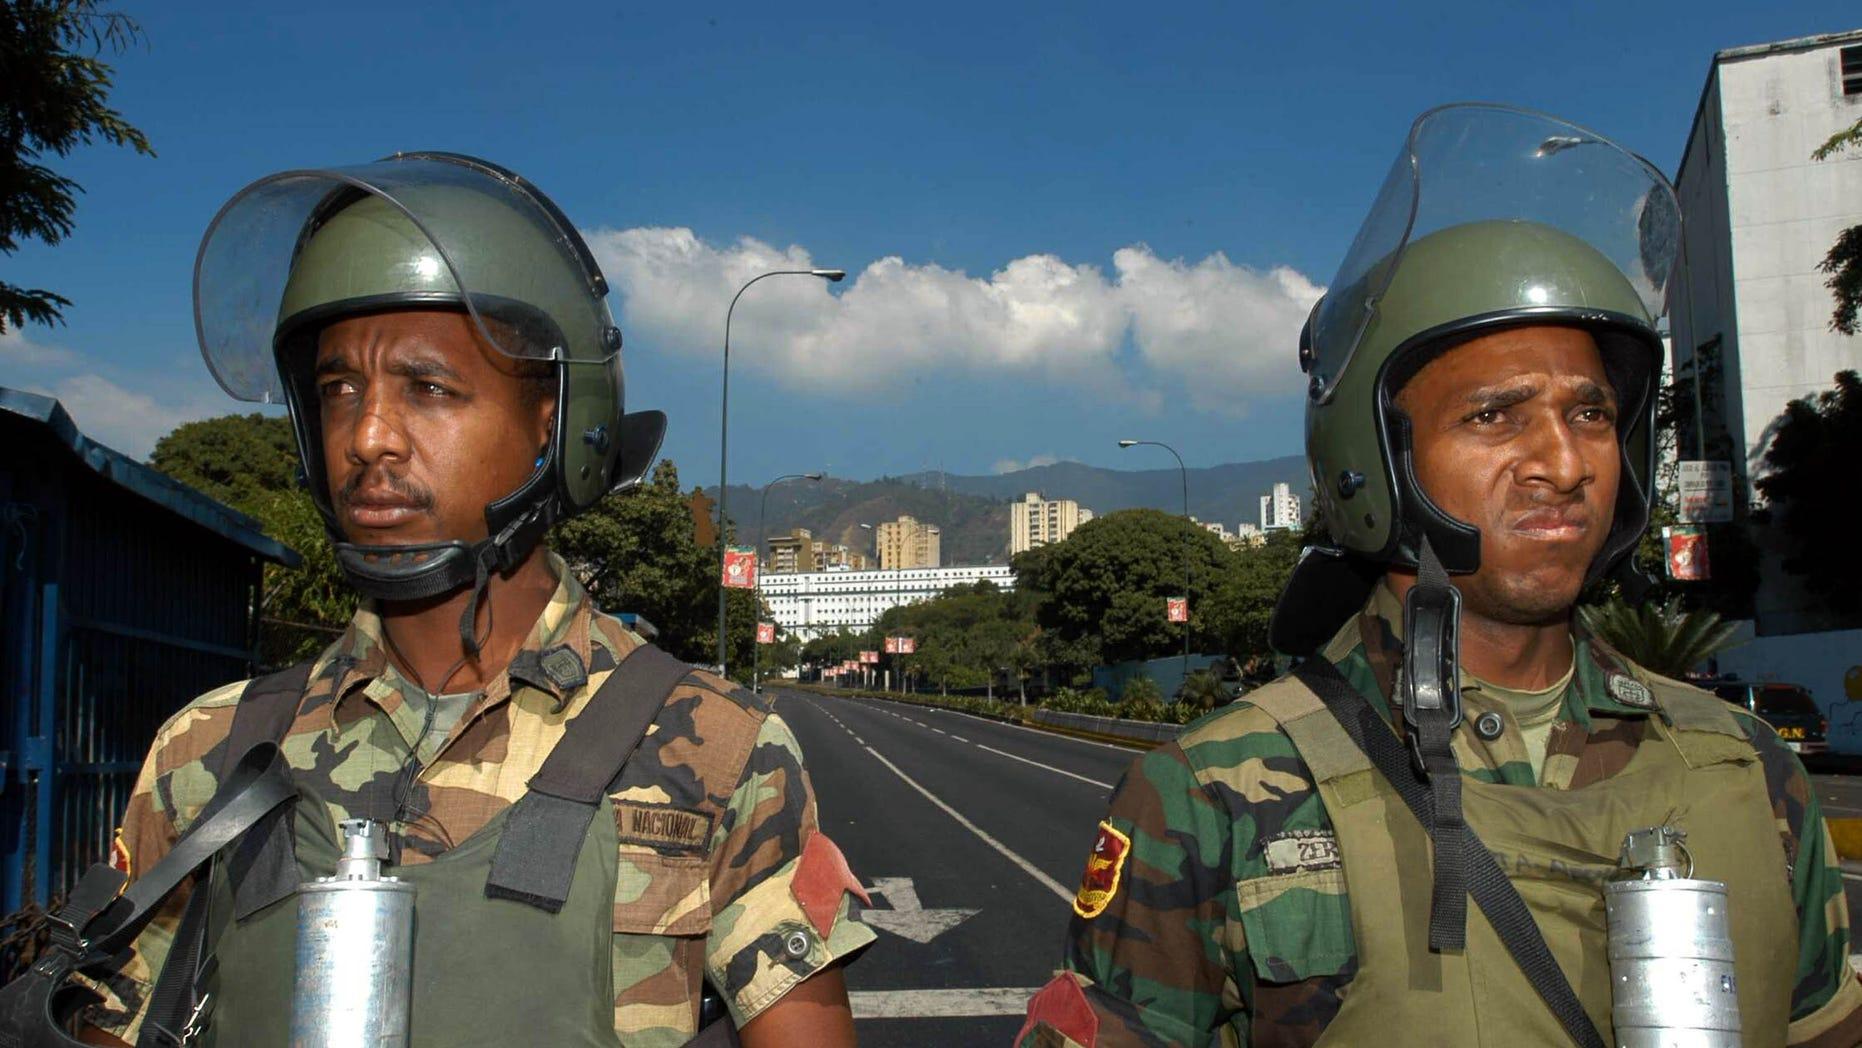 Members of the National Guard near the Miraflores Palace in Caracas, Venezuela.